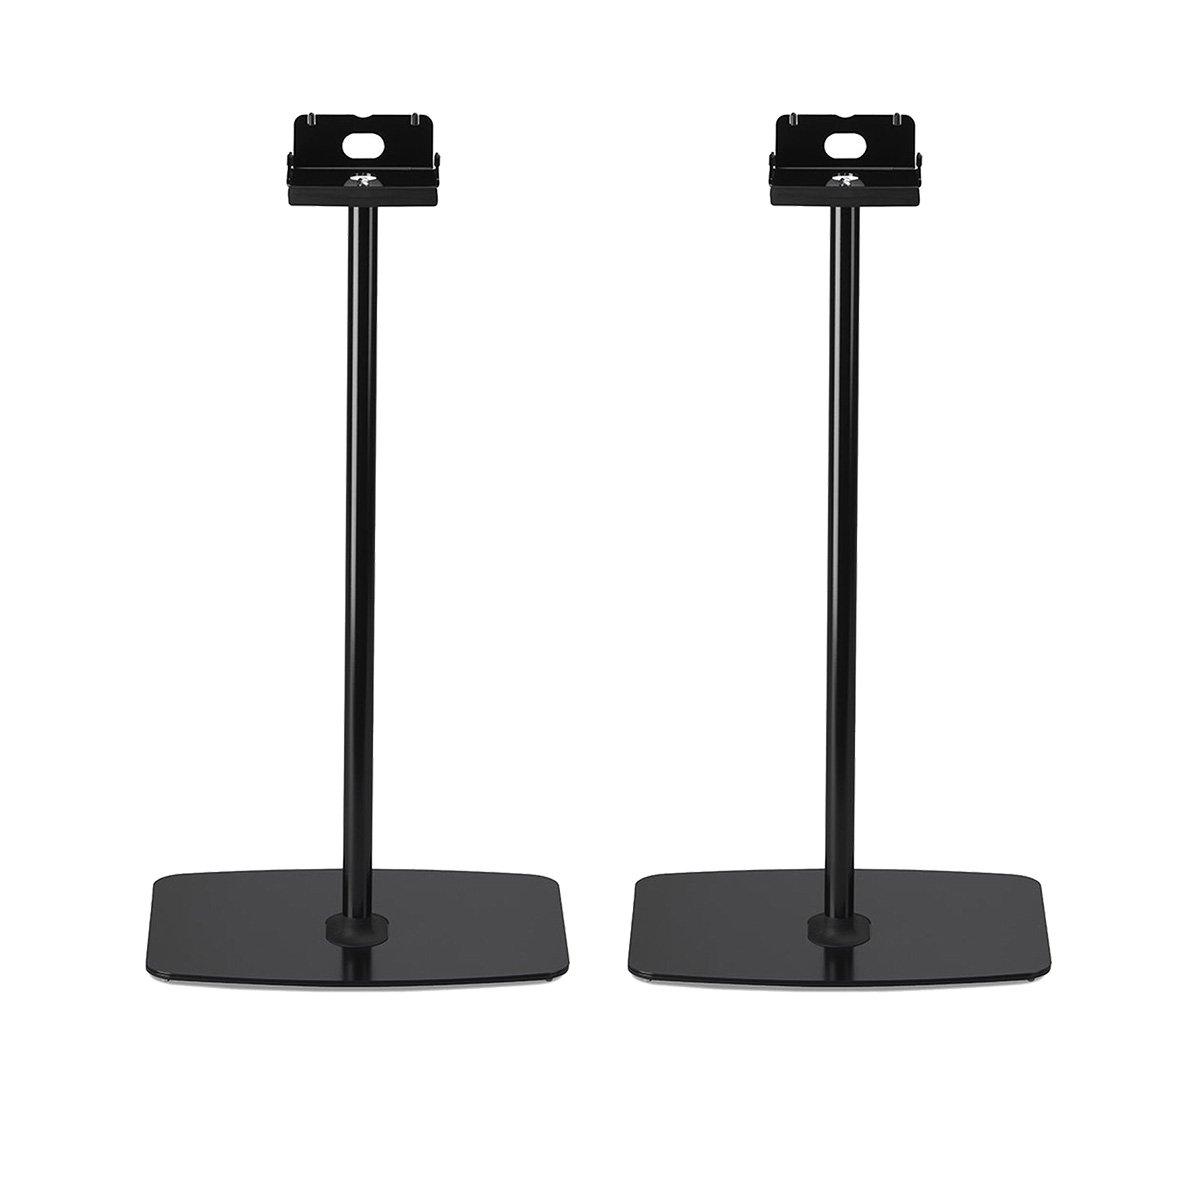 Flexson Horizontal Floor Stands for Sonos PLAY:5 - Pair (Black)